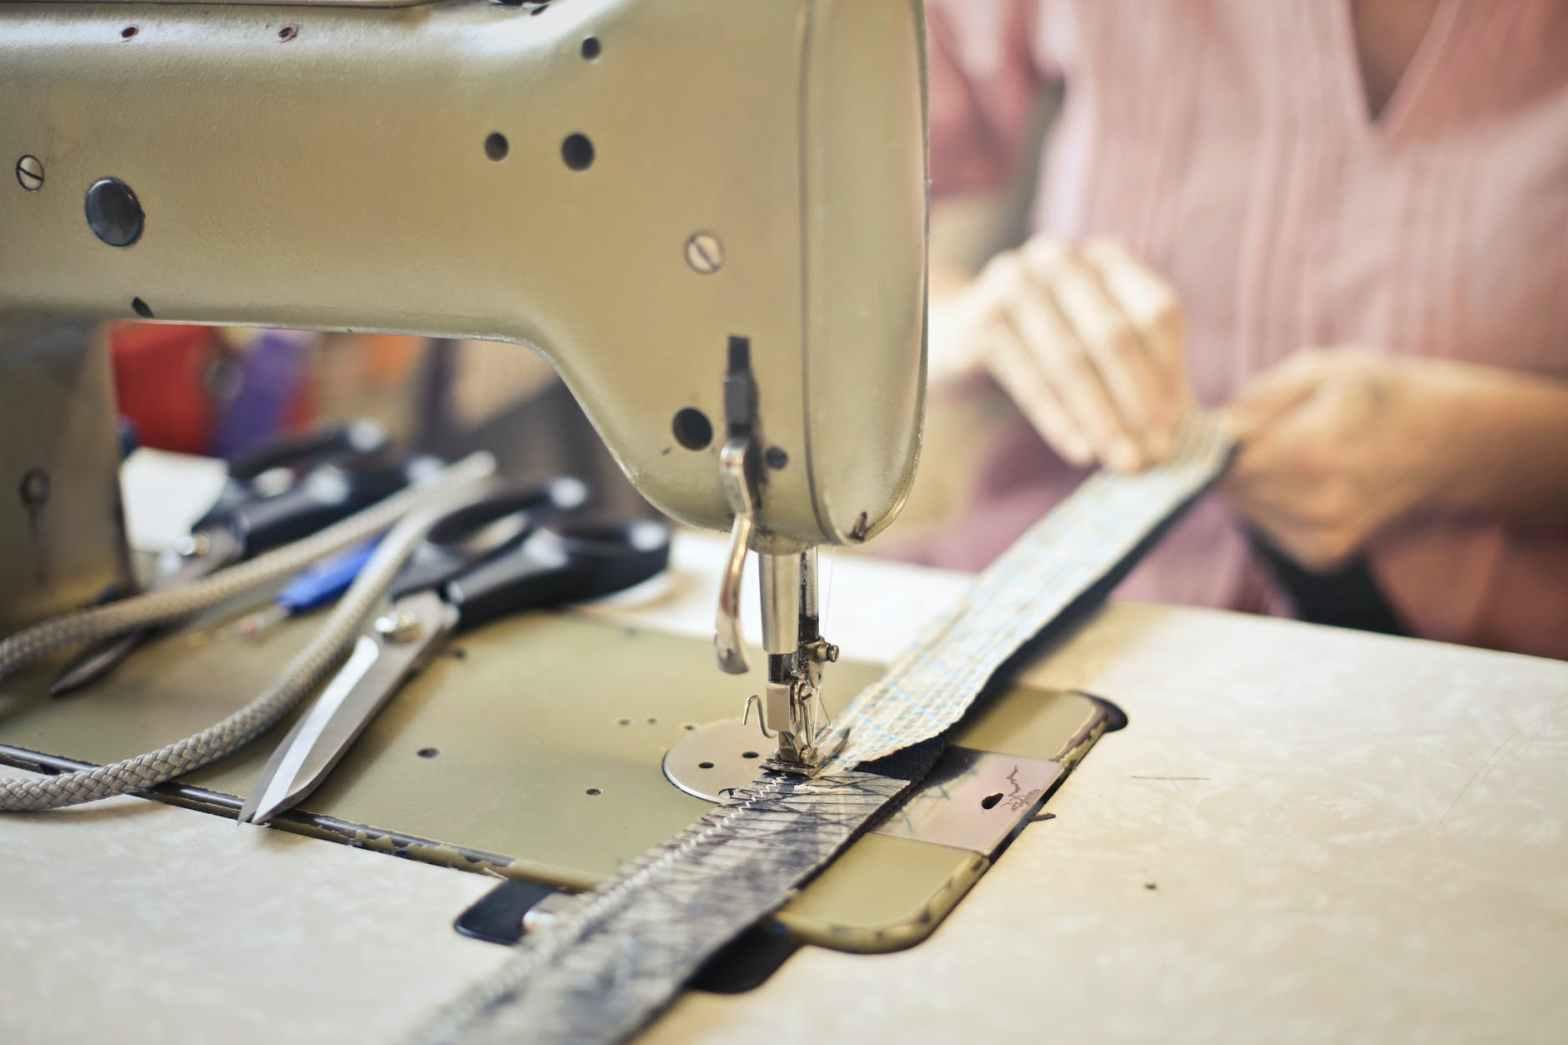 seamstress stitching clothing item on sewing machine